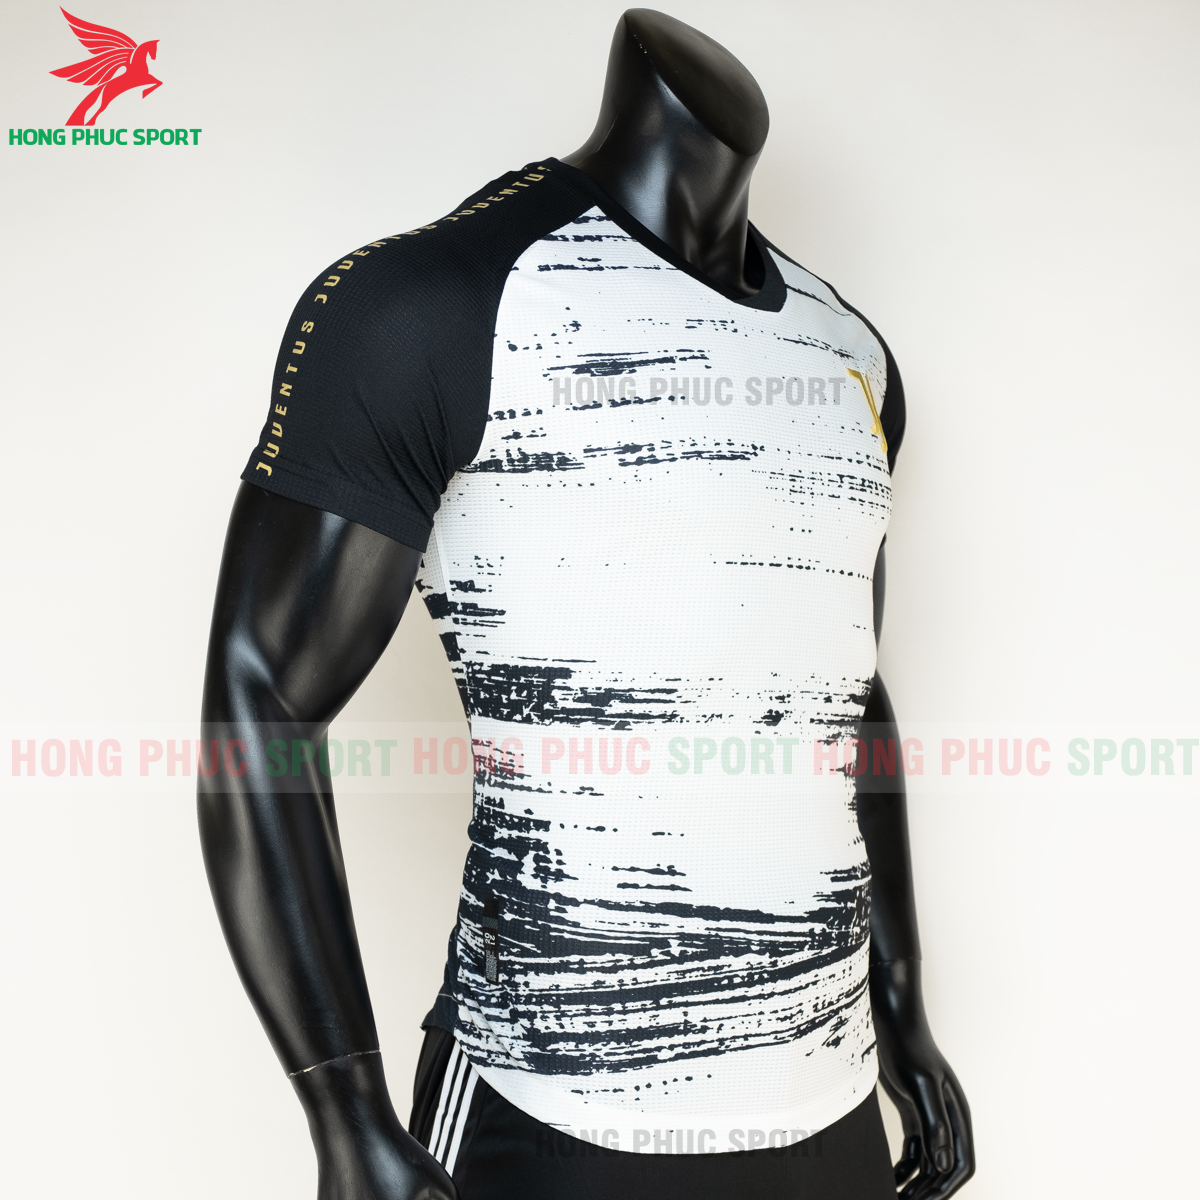 https://cdn.hongphucsport.com/unsafe/s4.shopbay.vn/files/285/ao-bong-da-juventus-20-21-pre-match-hang-thailand-5-5faf4ce512670.png